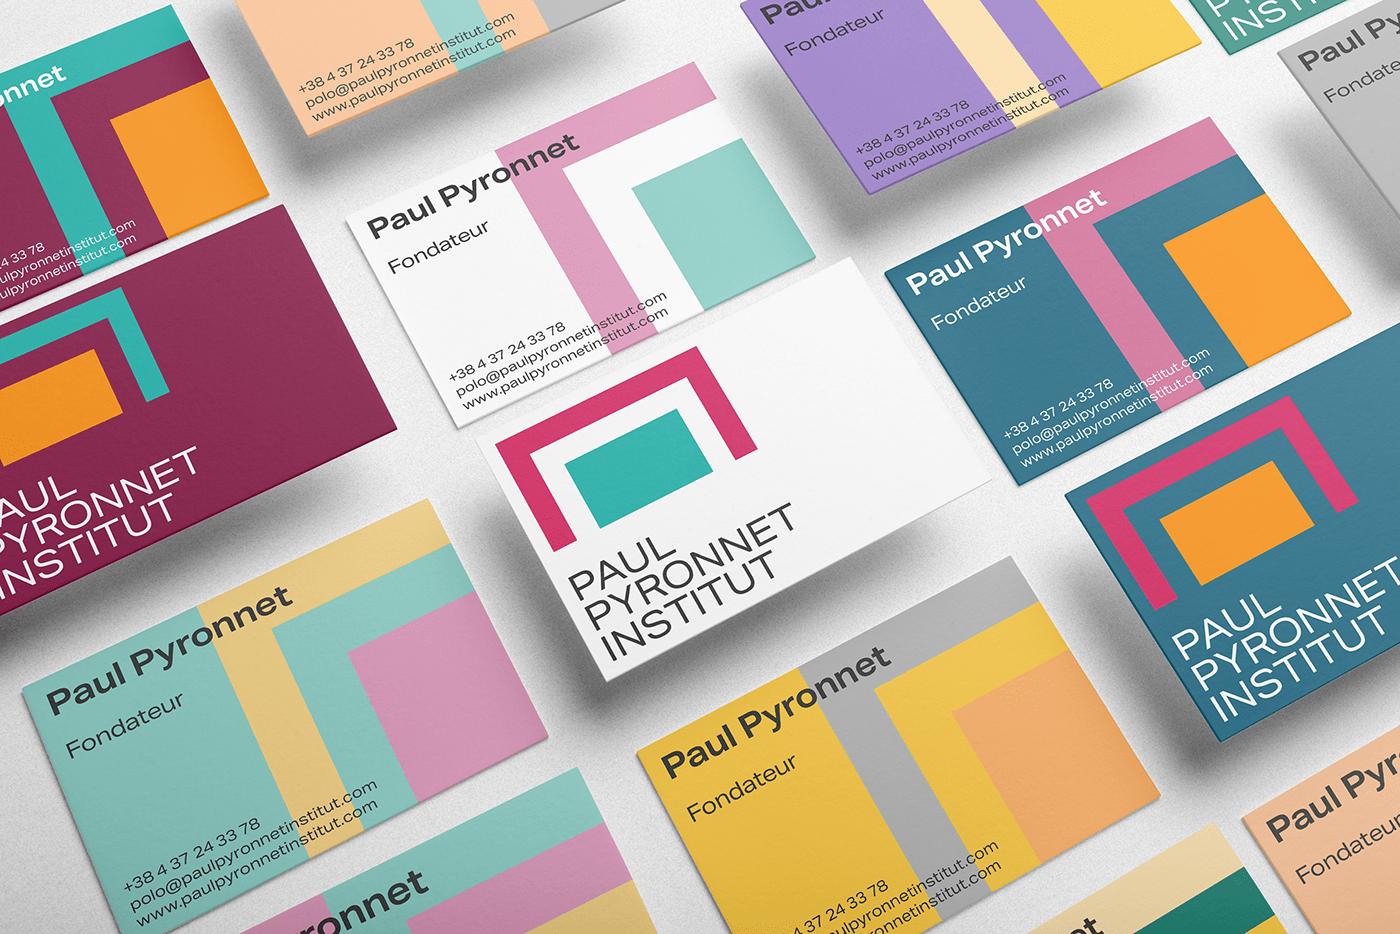 Paul Pyronnet Institut business cards